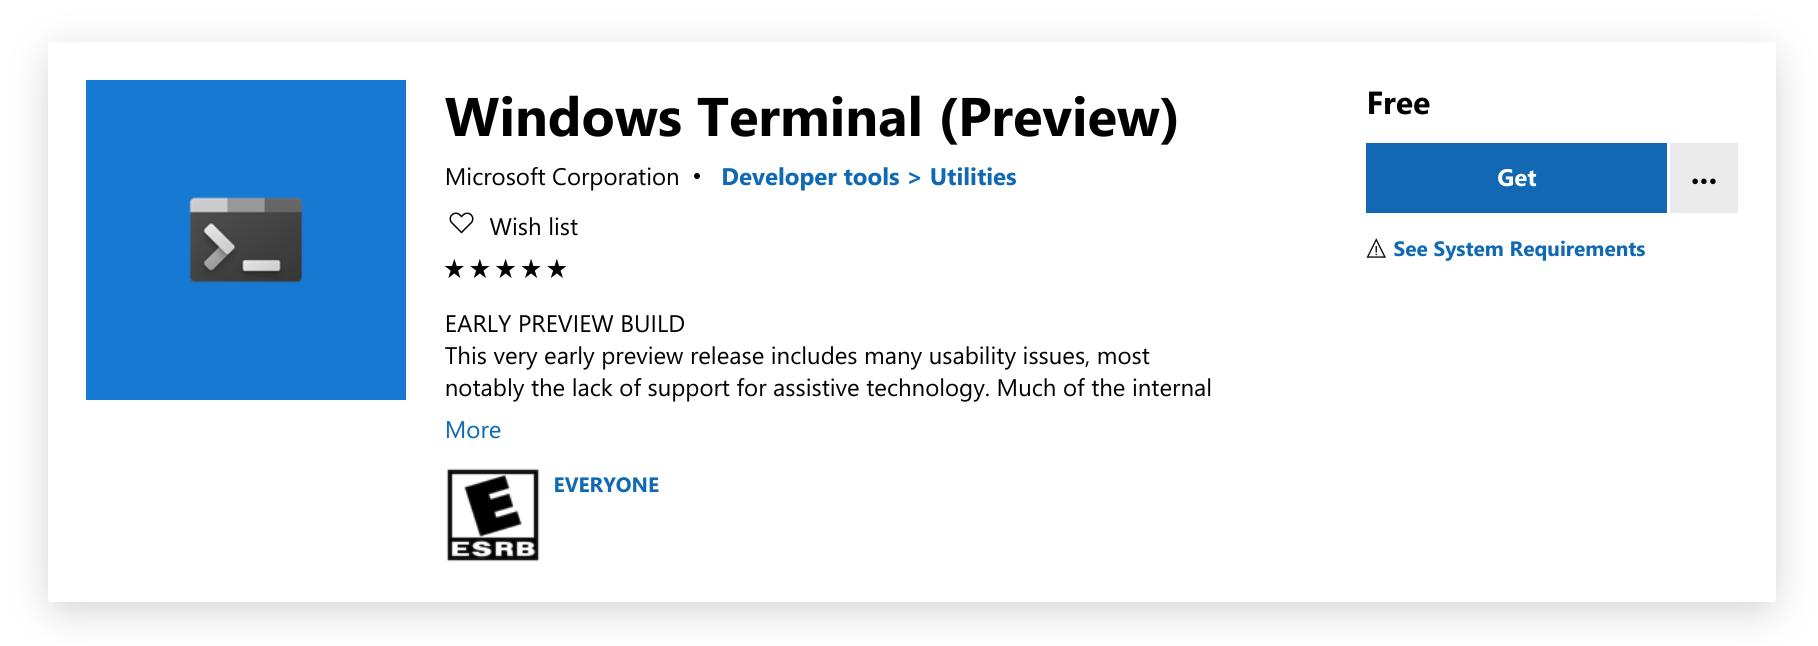 Windows Terminal 已上架,快尝鲜